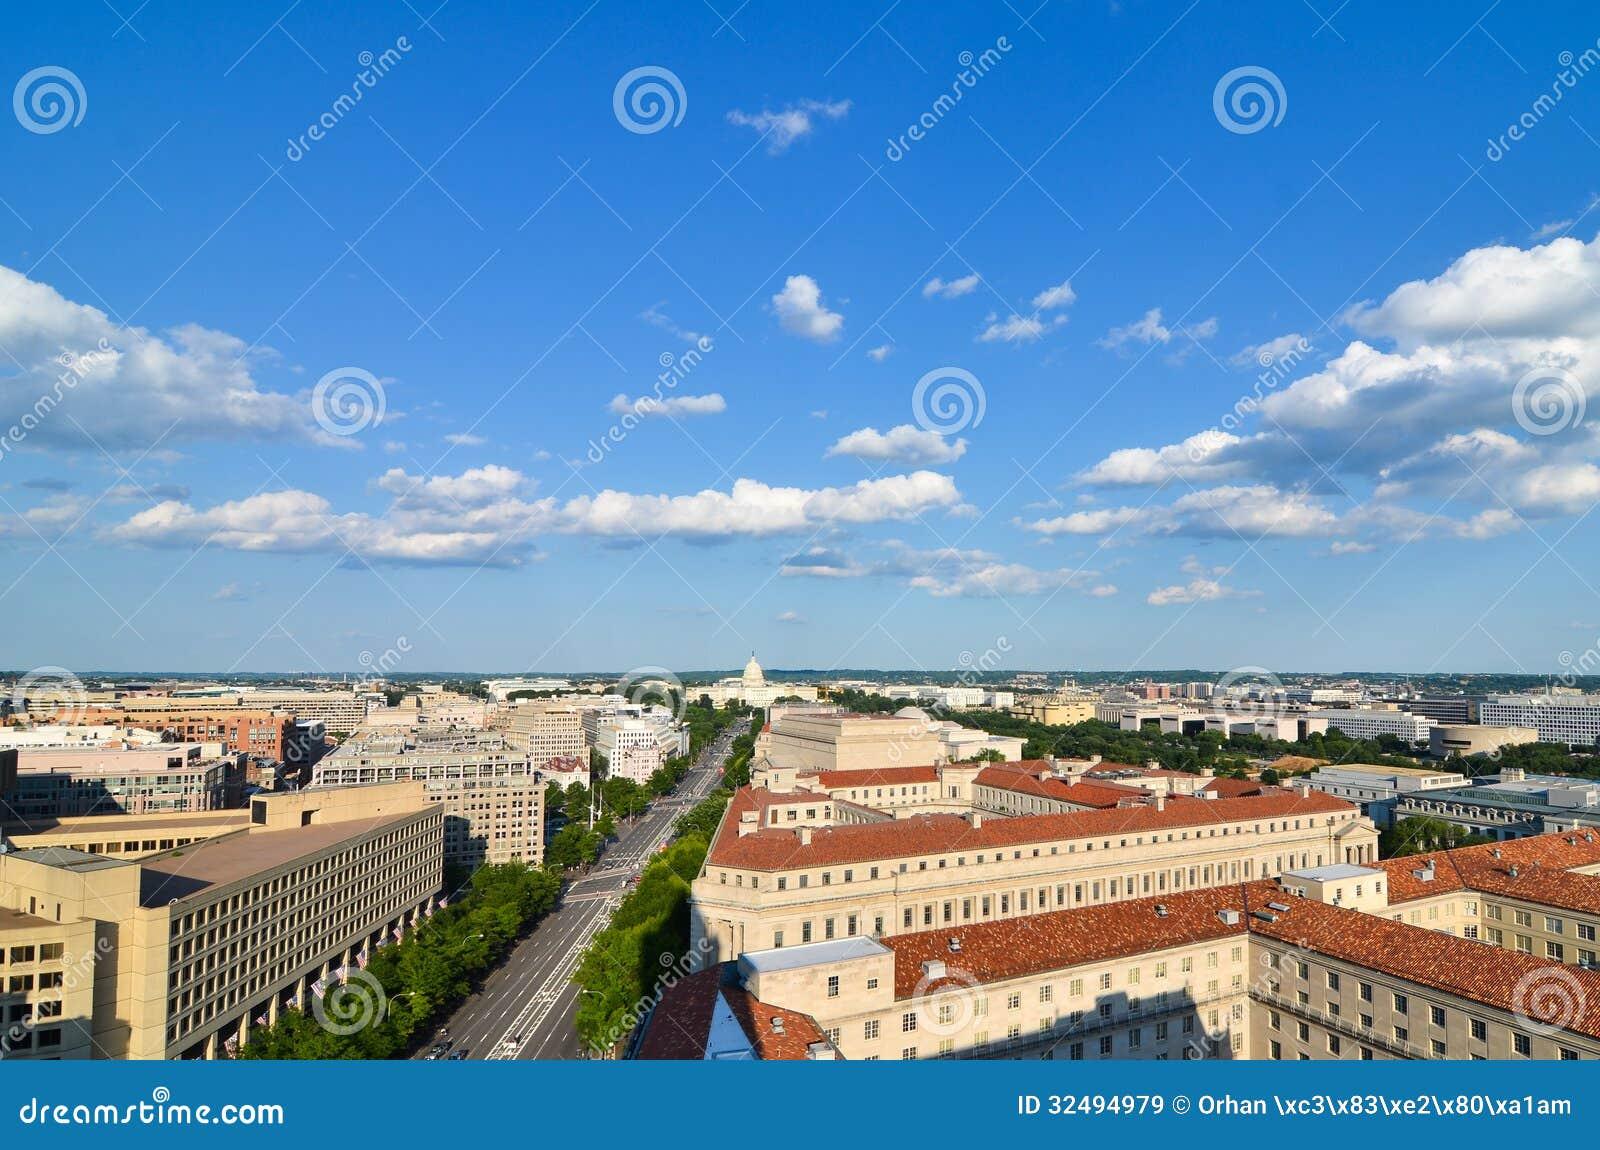 washington d c aerial view with us capitol stock image Washington DC Clip Art washington monument climate